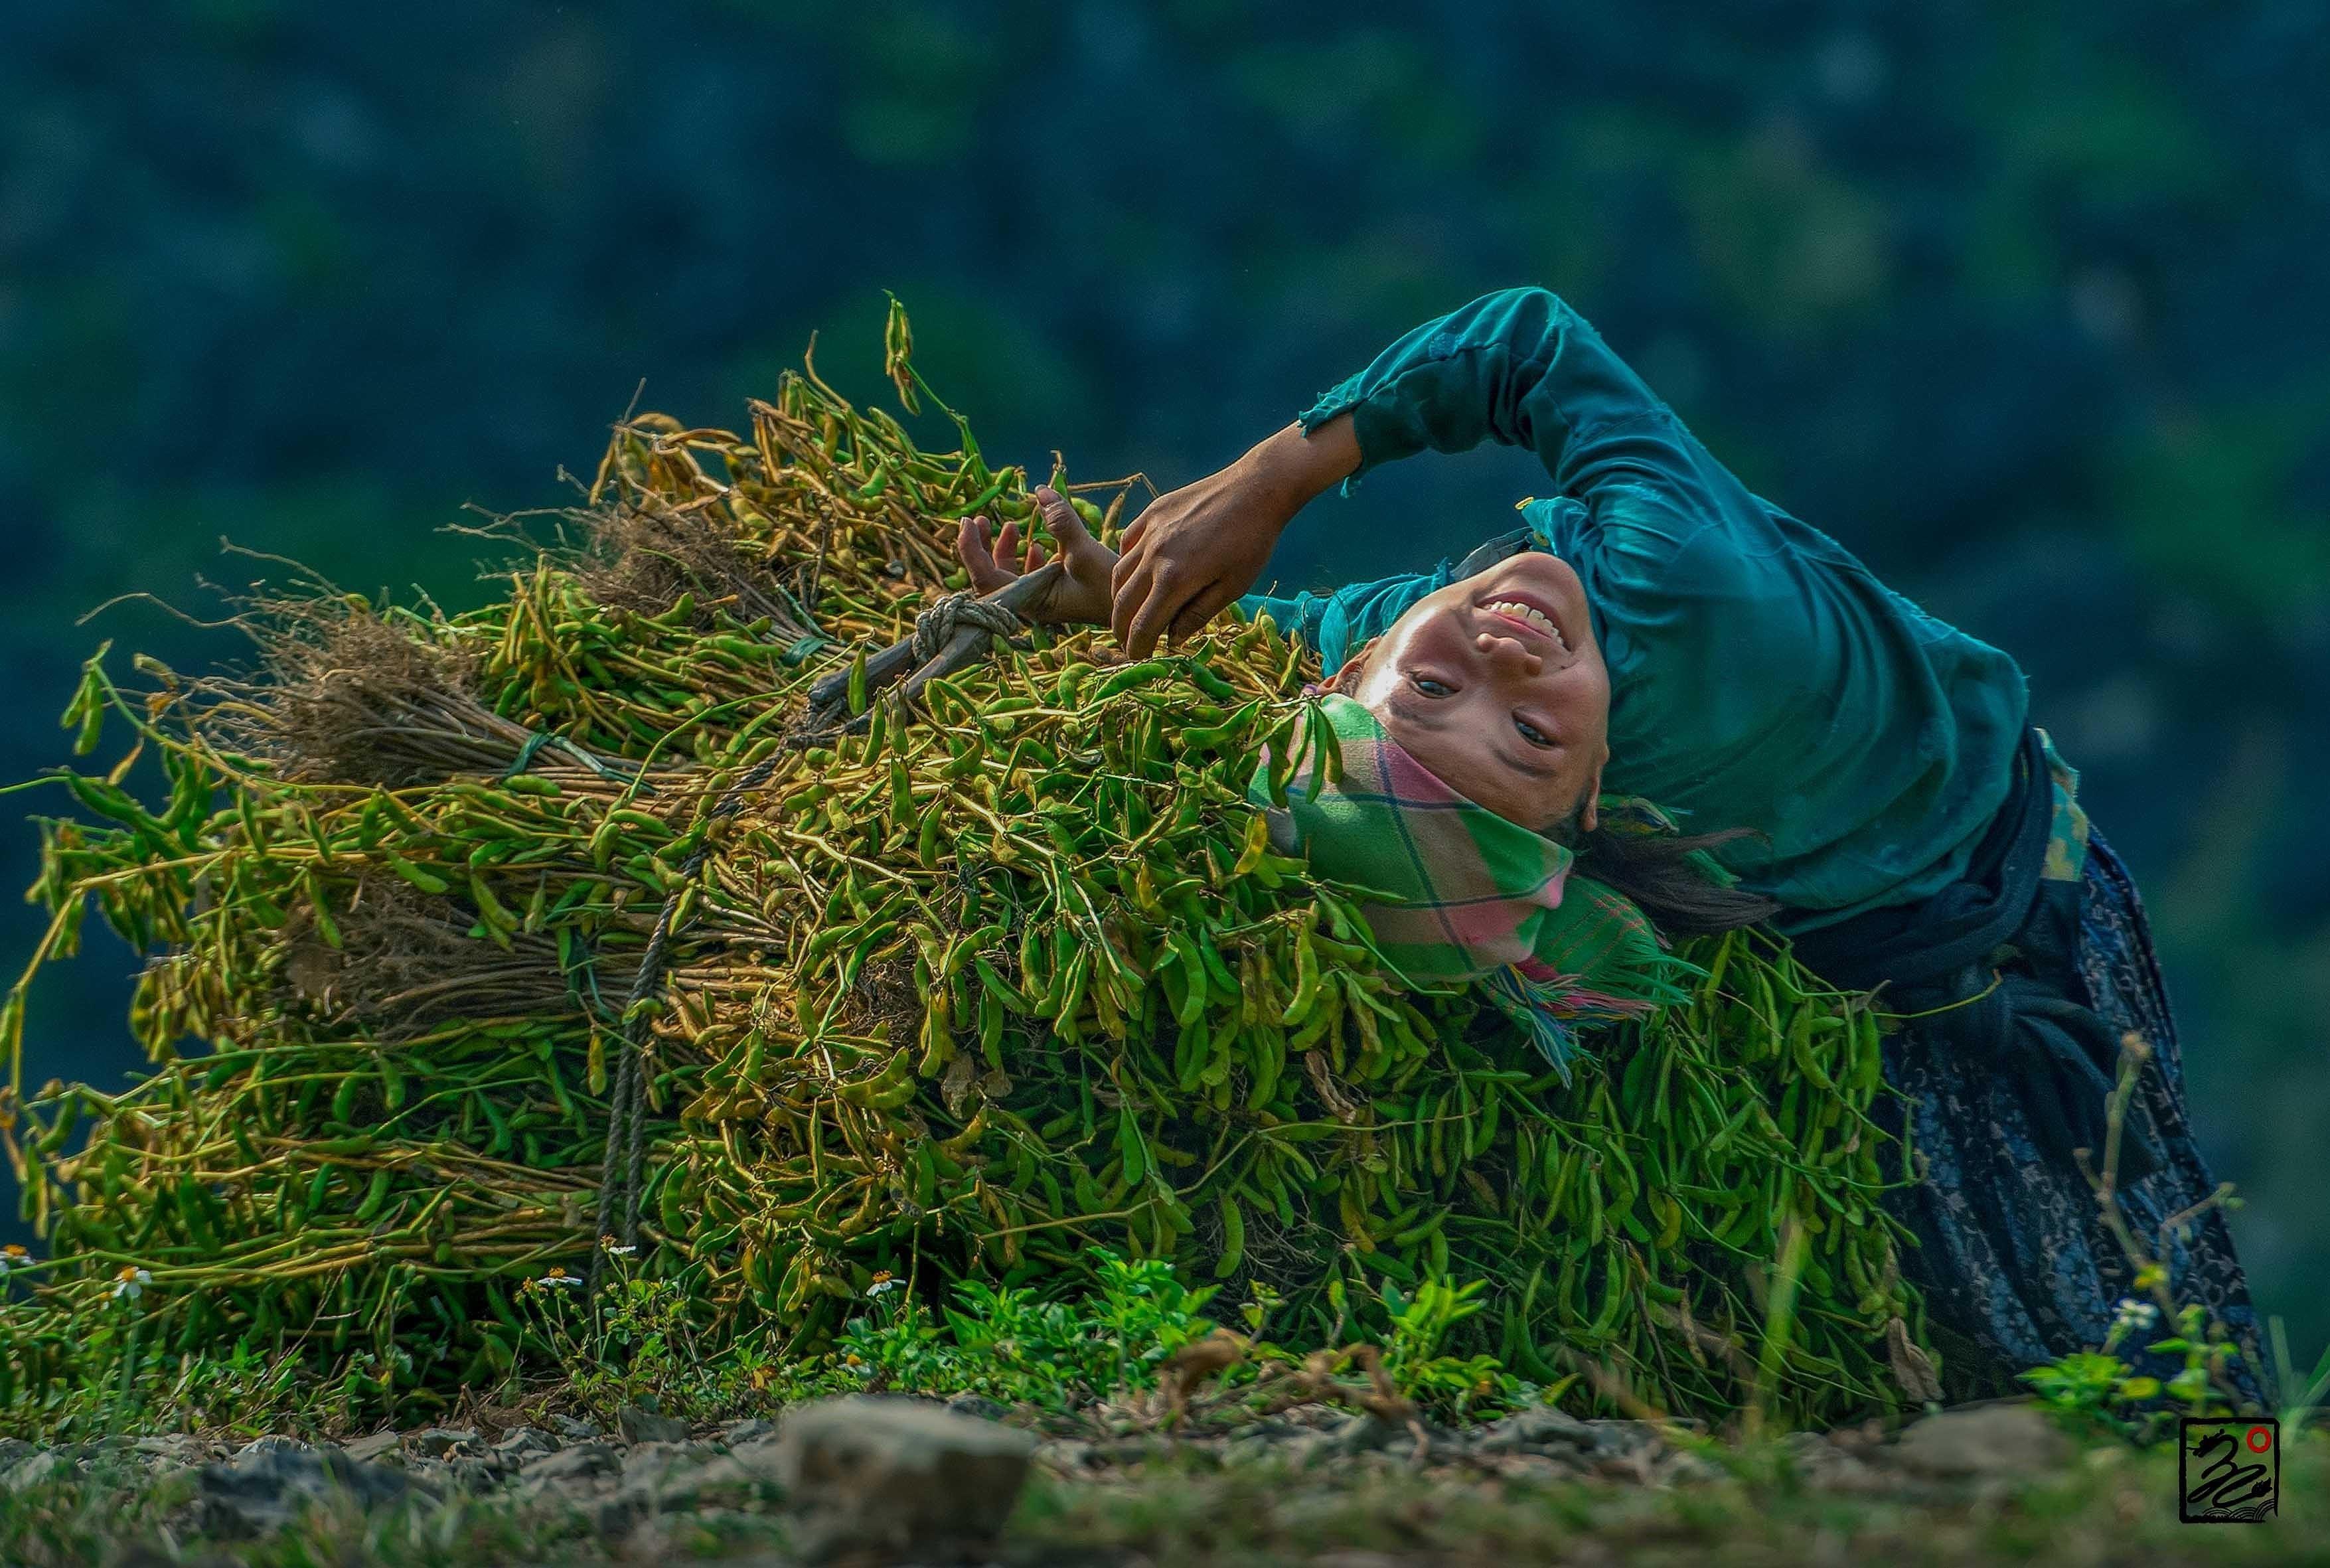 Photo exhibition showcasing Vietnam's beauty hinh anh 3